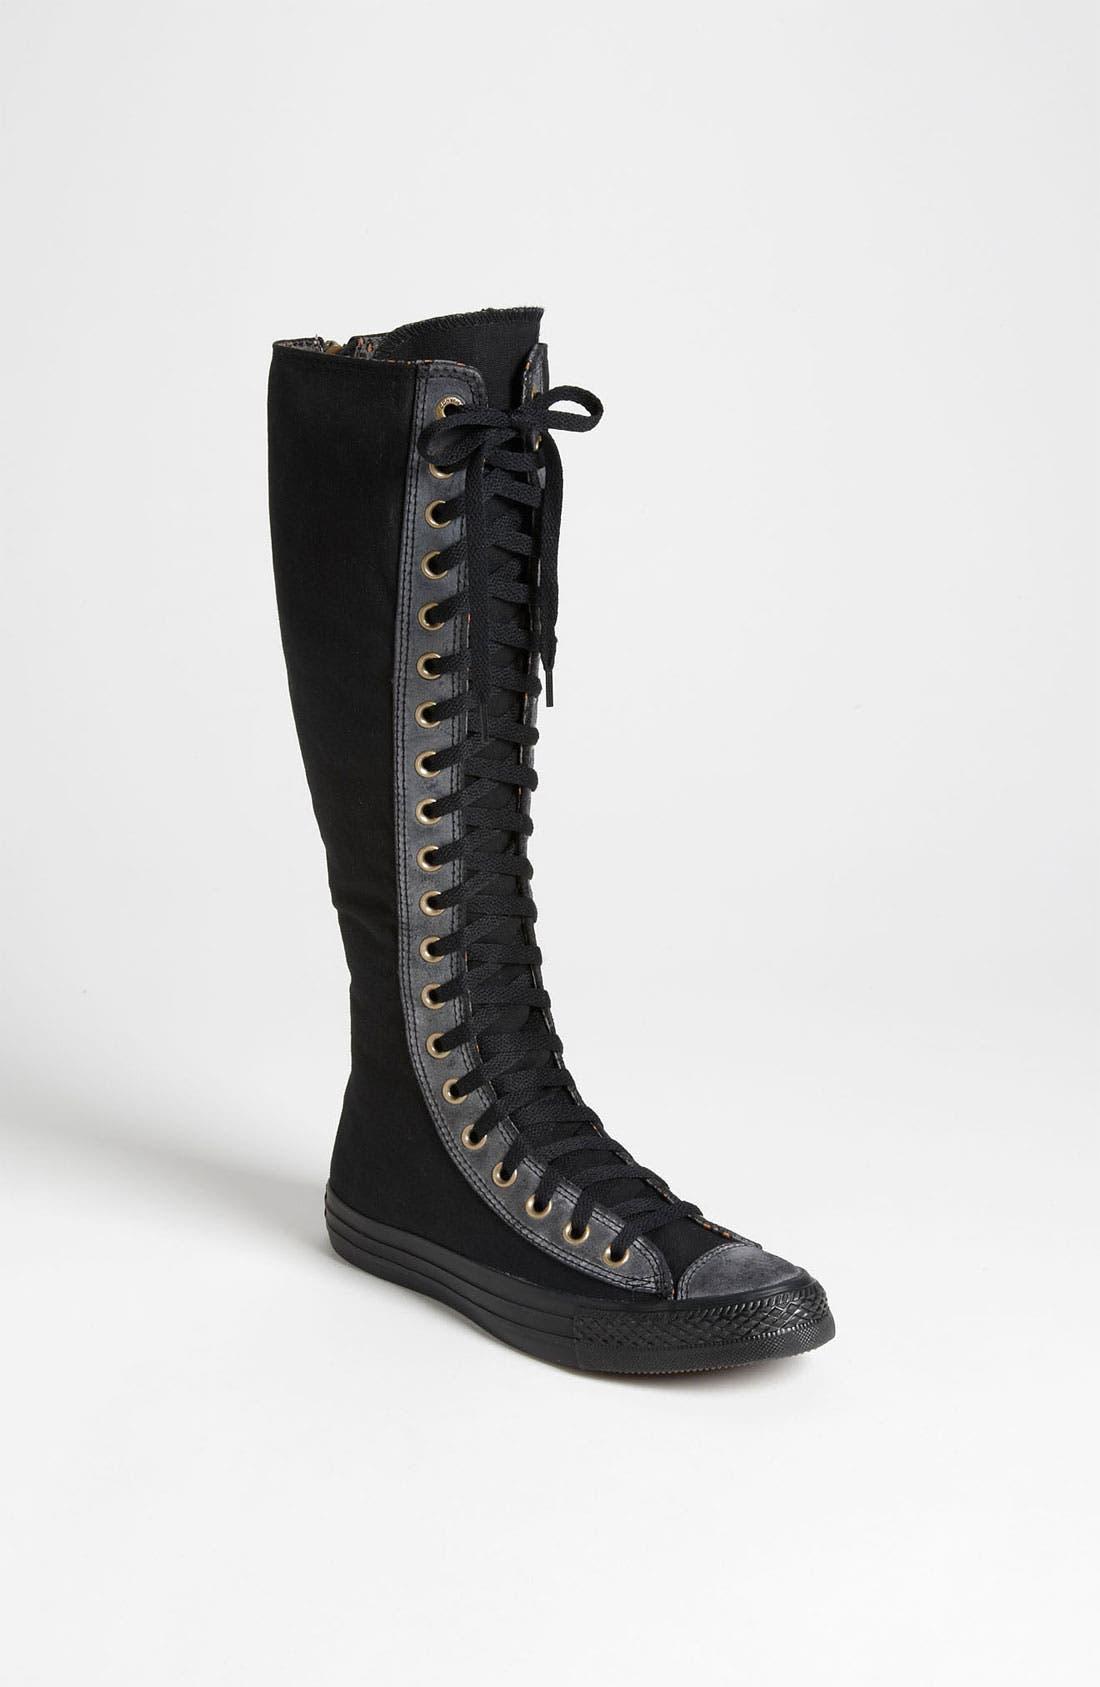 Alternate Image 1 Selected - Converse 'Tall X-Hi' Sneaker (Women)